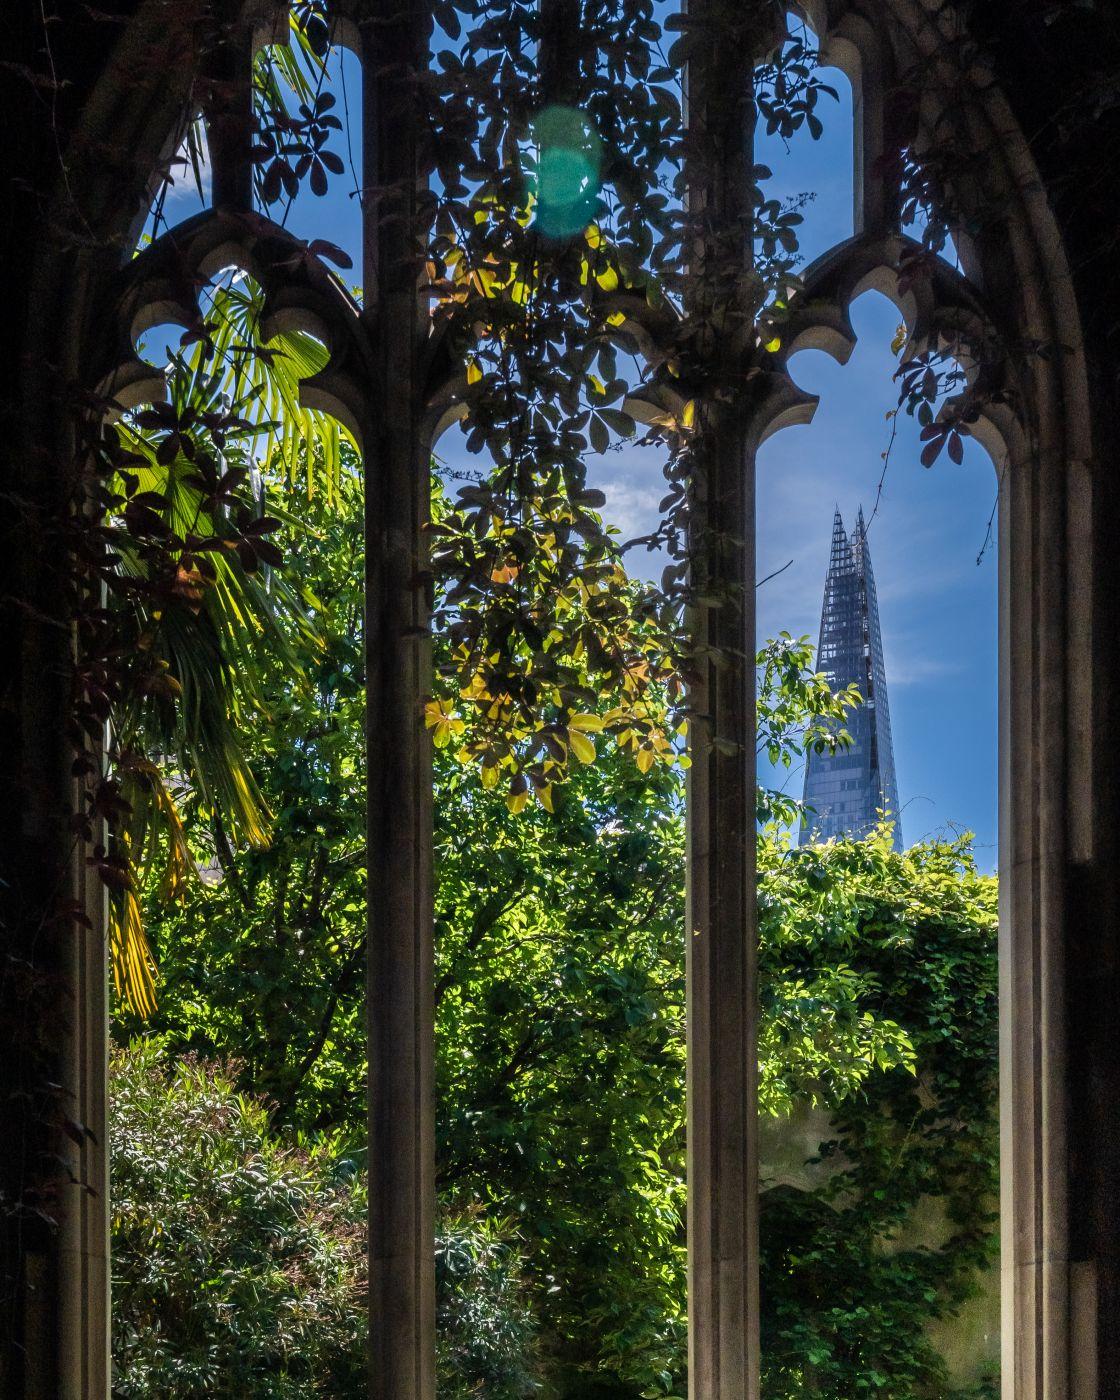 St Dunstan in the East church gardens, United Kingdom